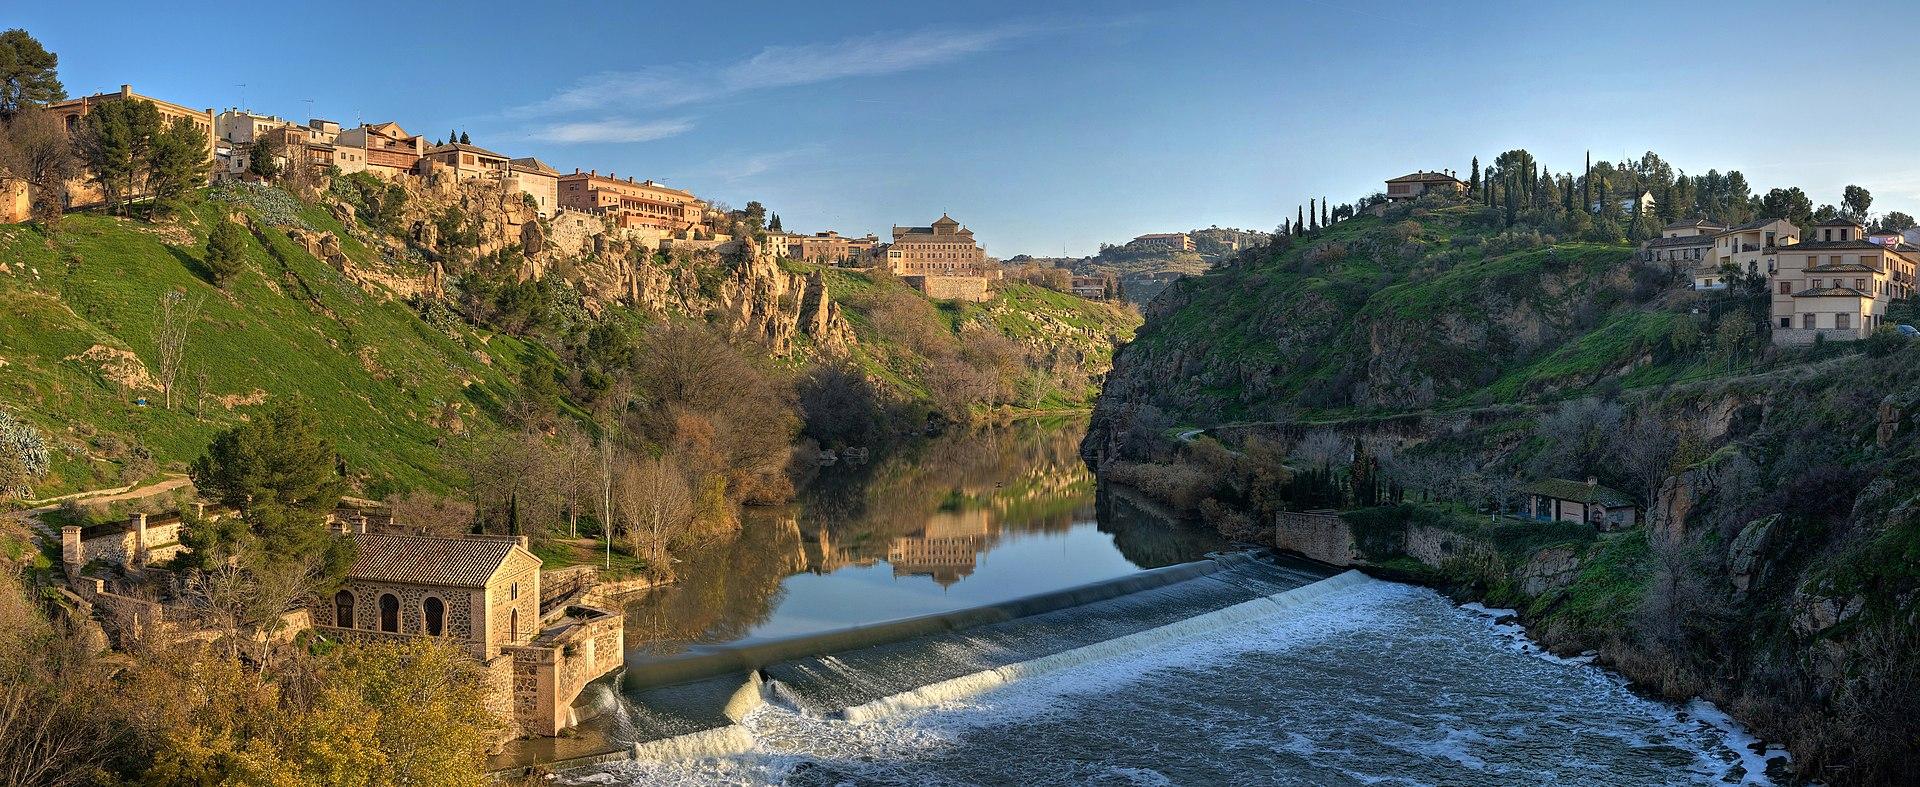 Tagus River Panorama - Toledo, Spain - Dec 2006.jpg